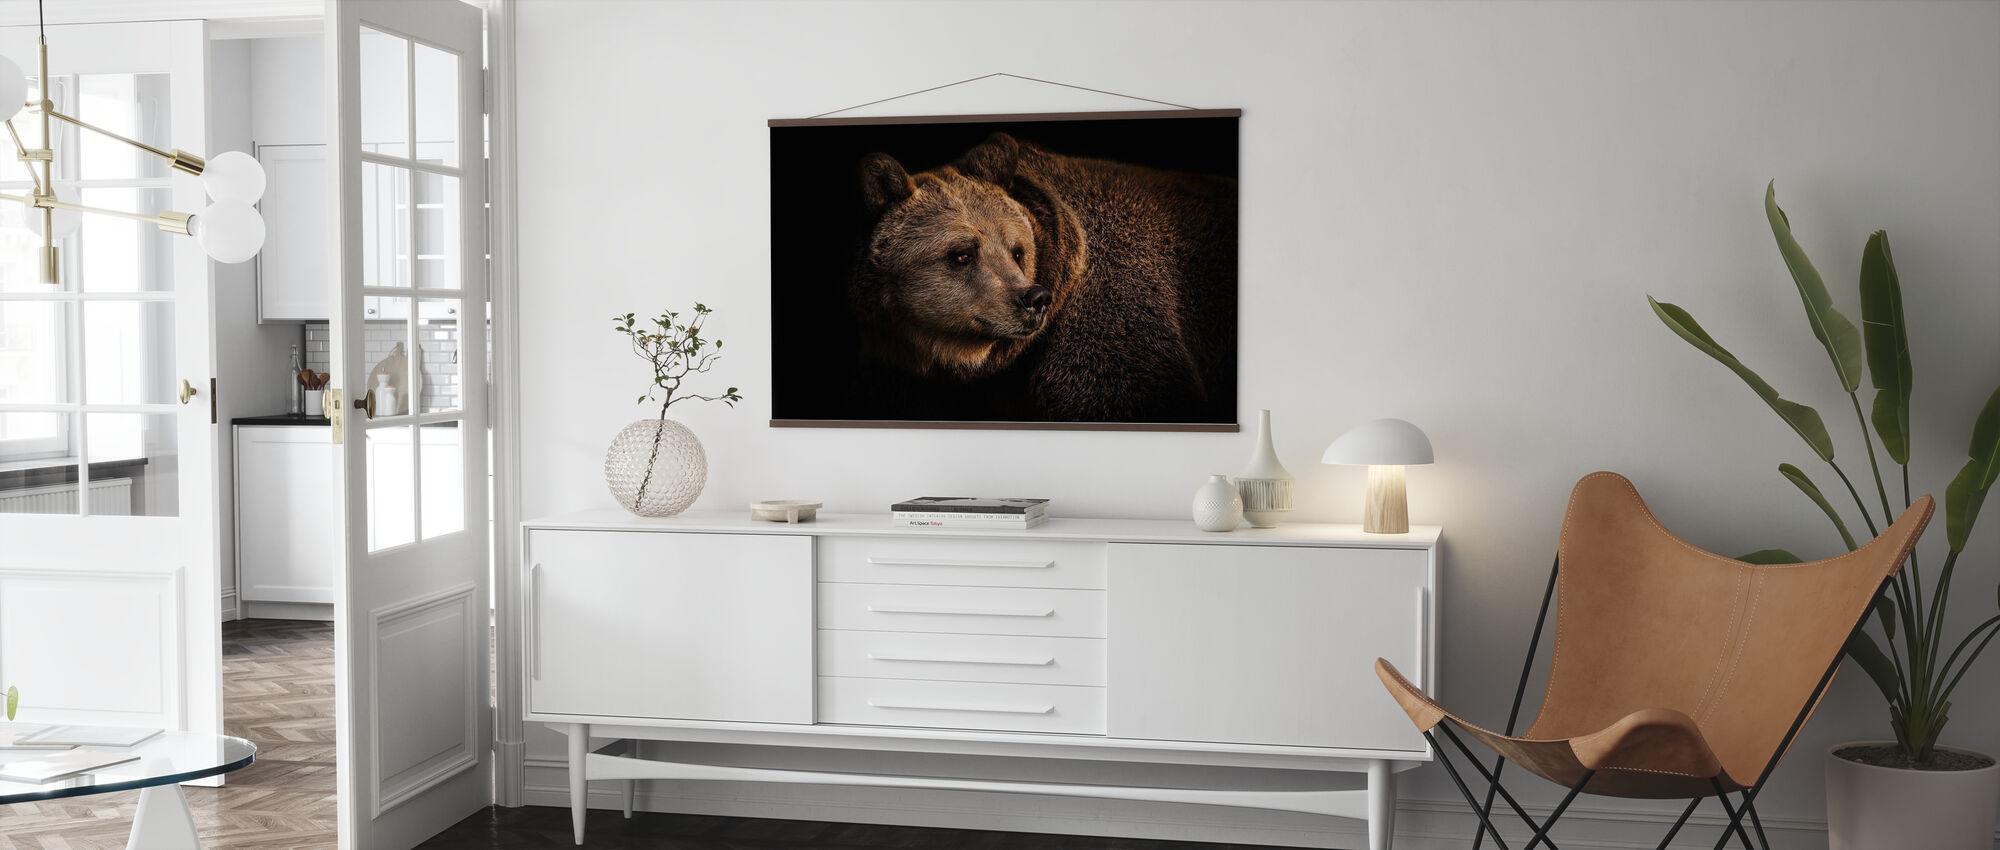 Brown Bear - Poster - Living Room